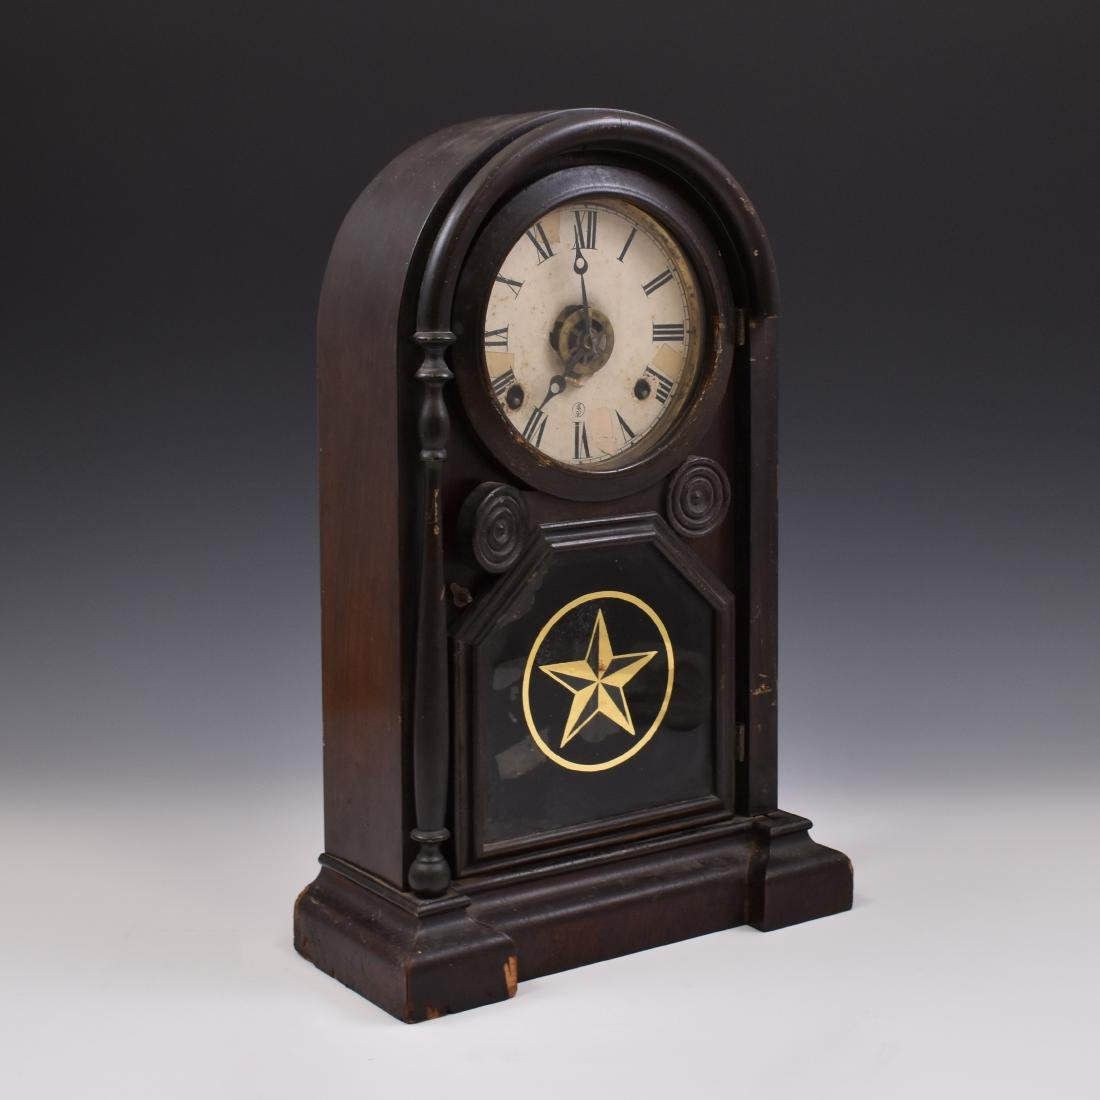 1868 ANTIQUE 8 DAY COTTAGE SHELF CLOCK